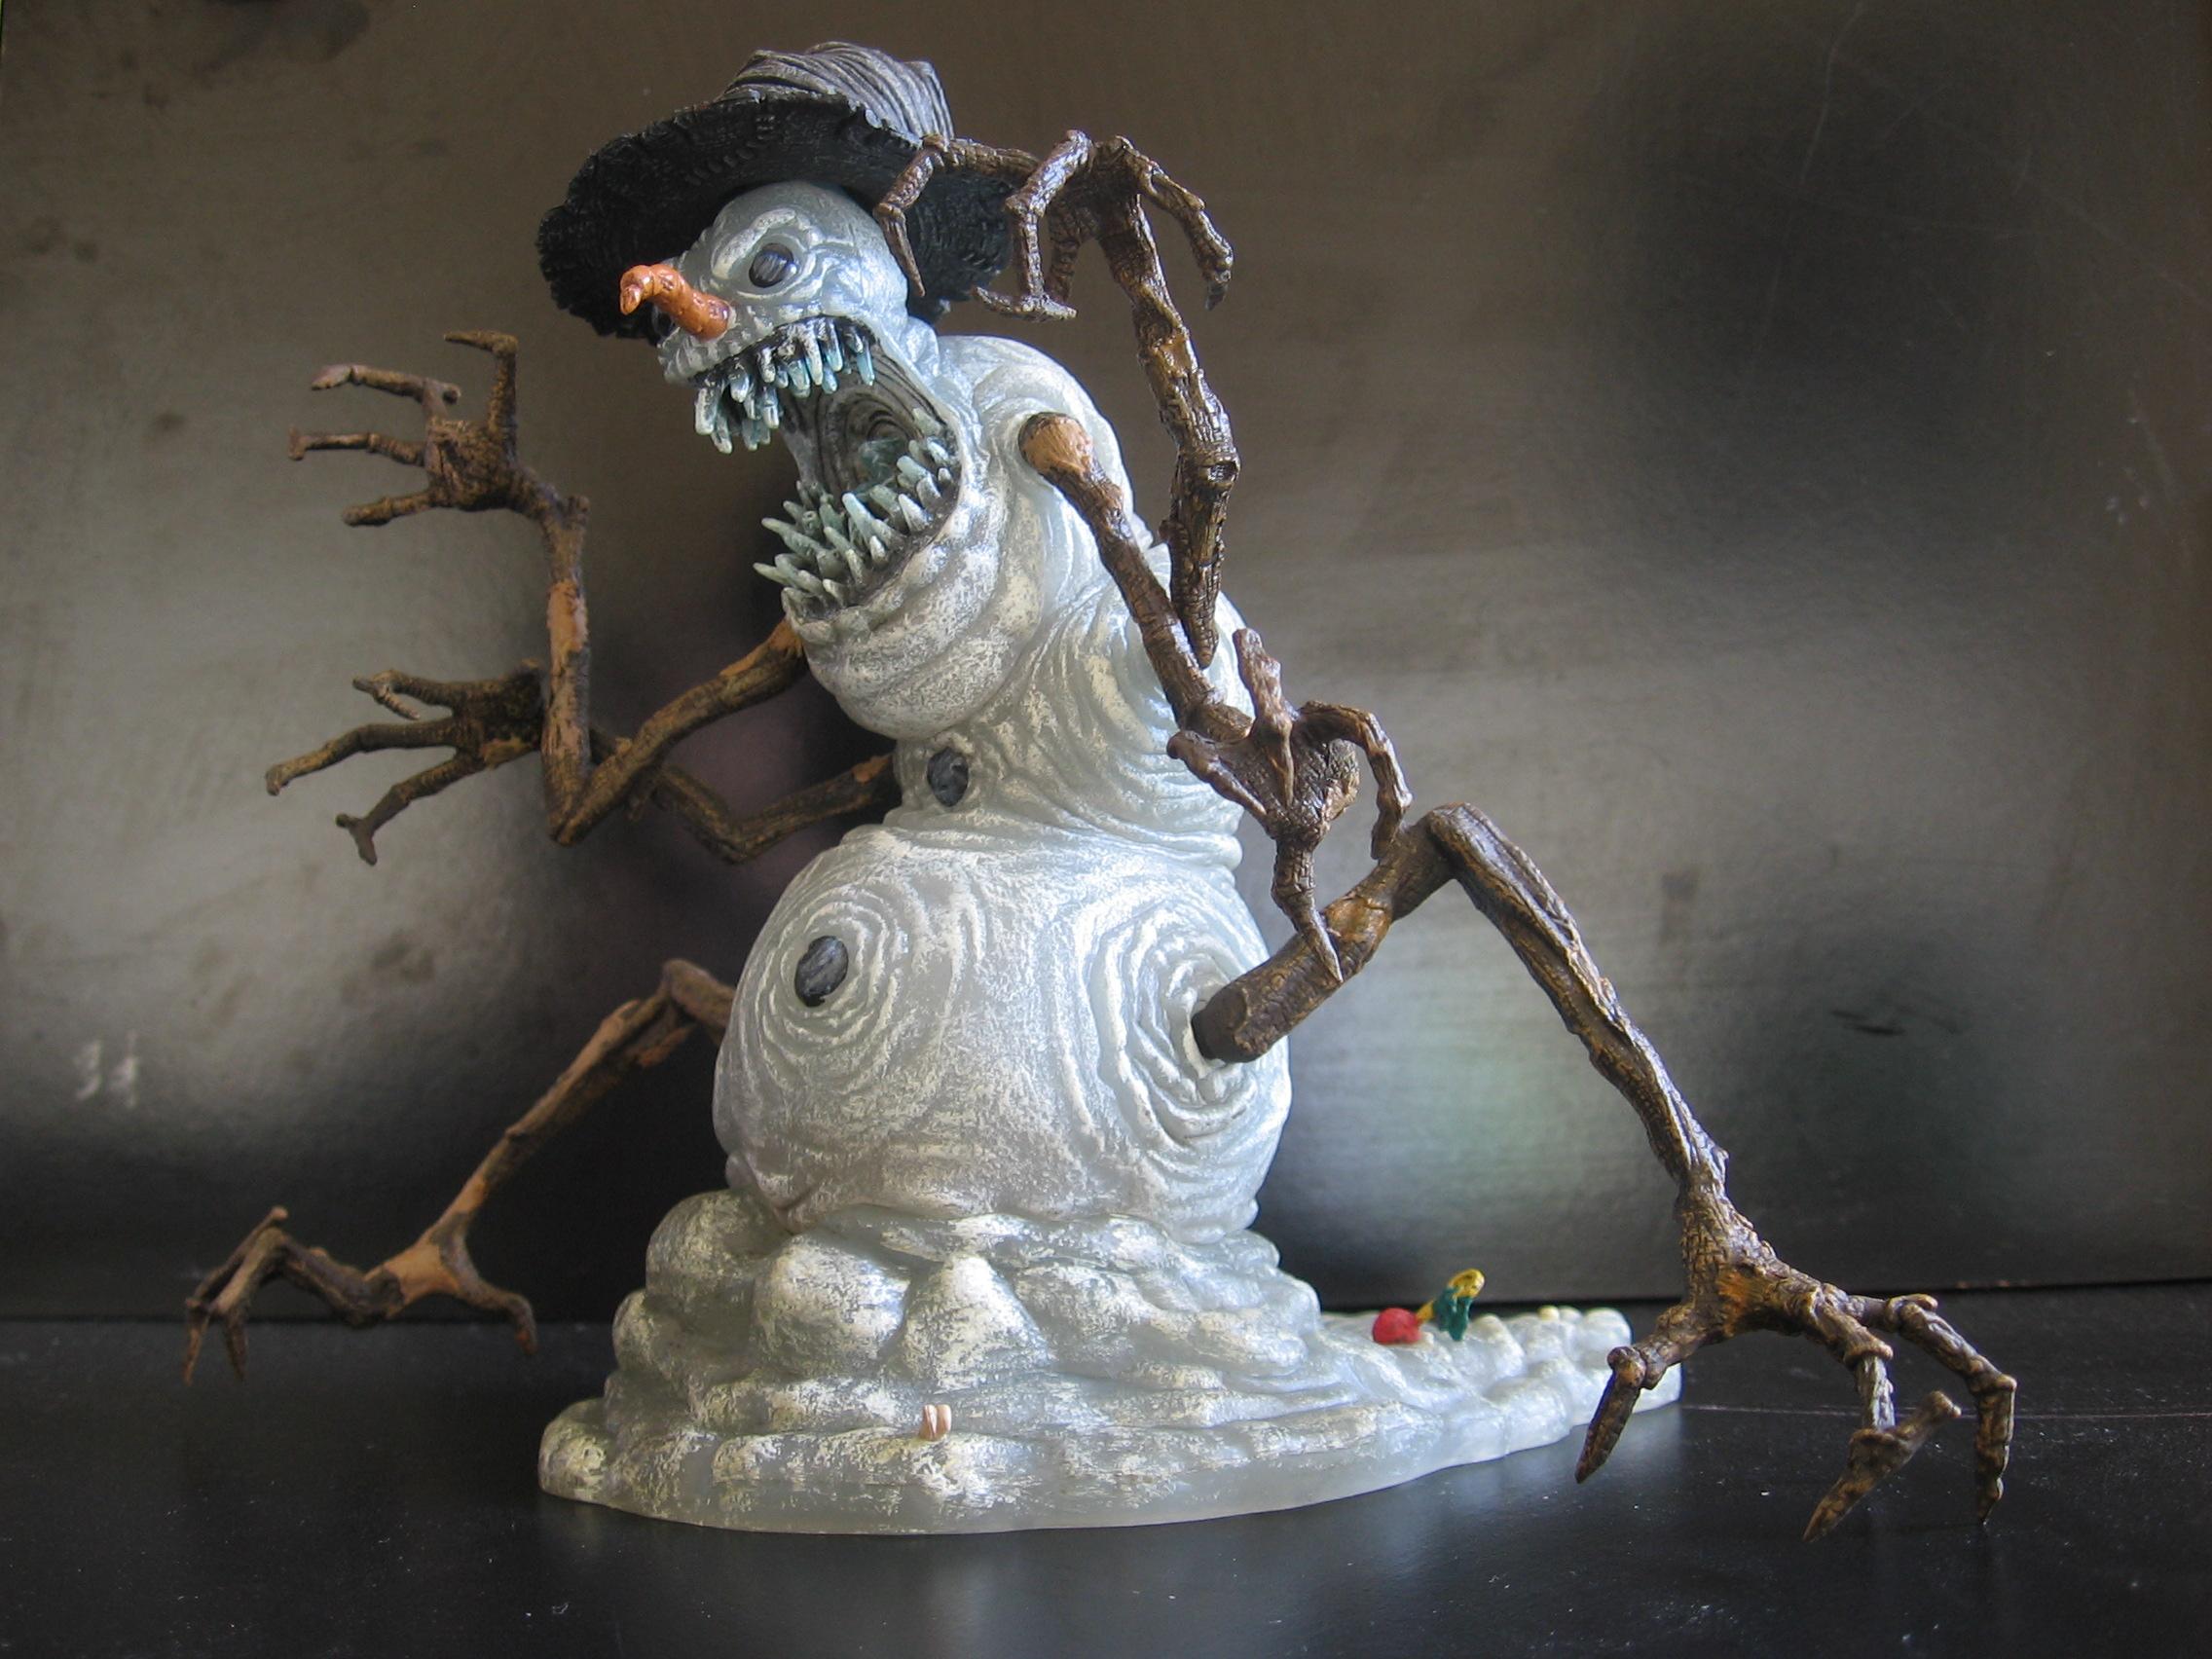 Snowman 02 by restmlinstock